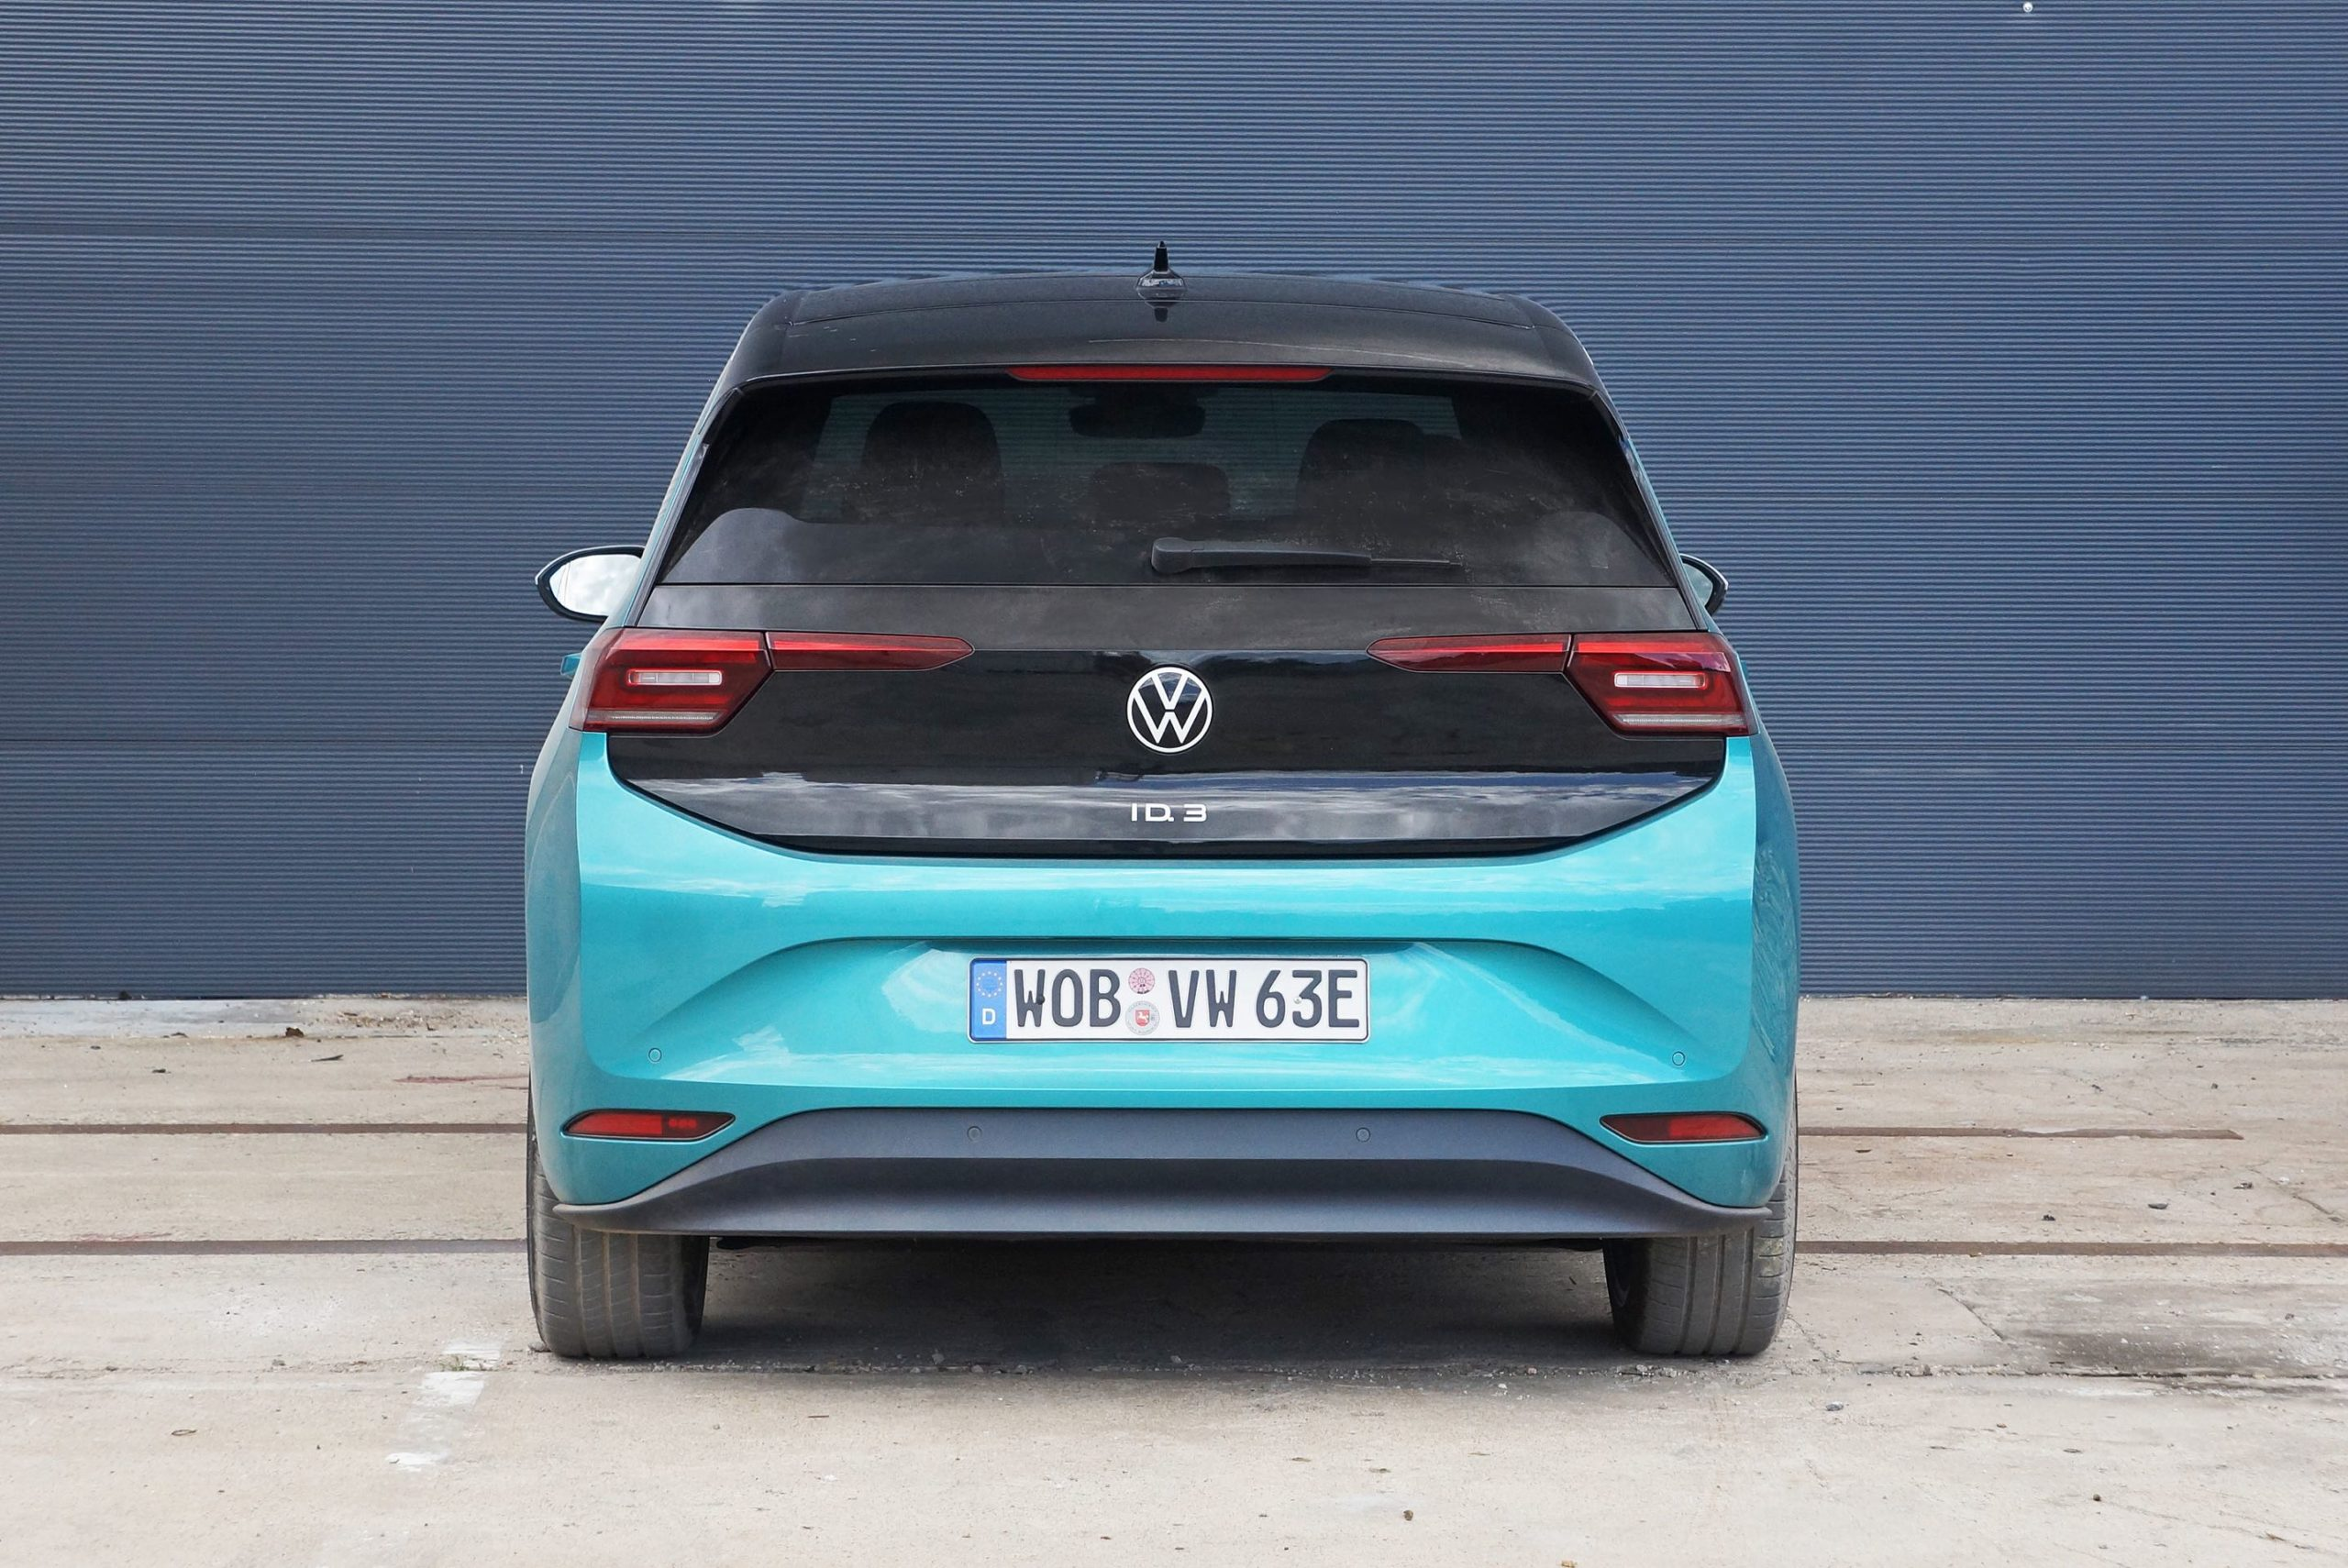 Blue VW ID 3